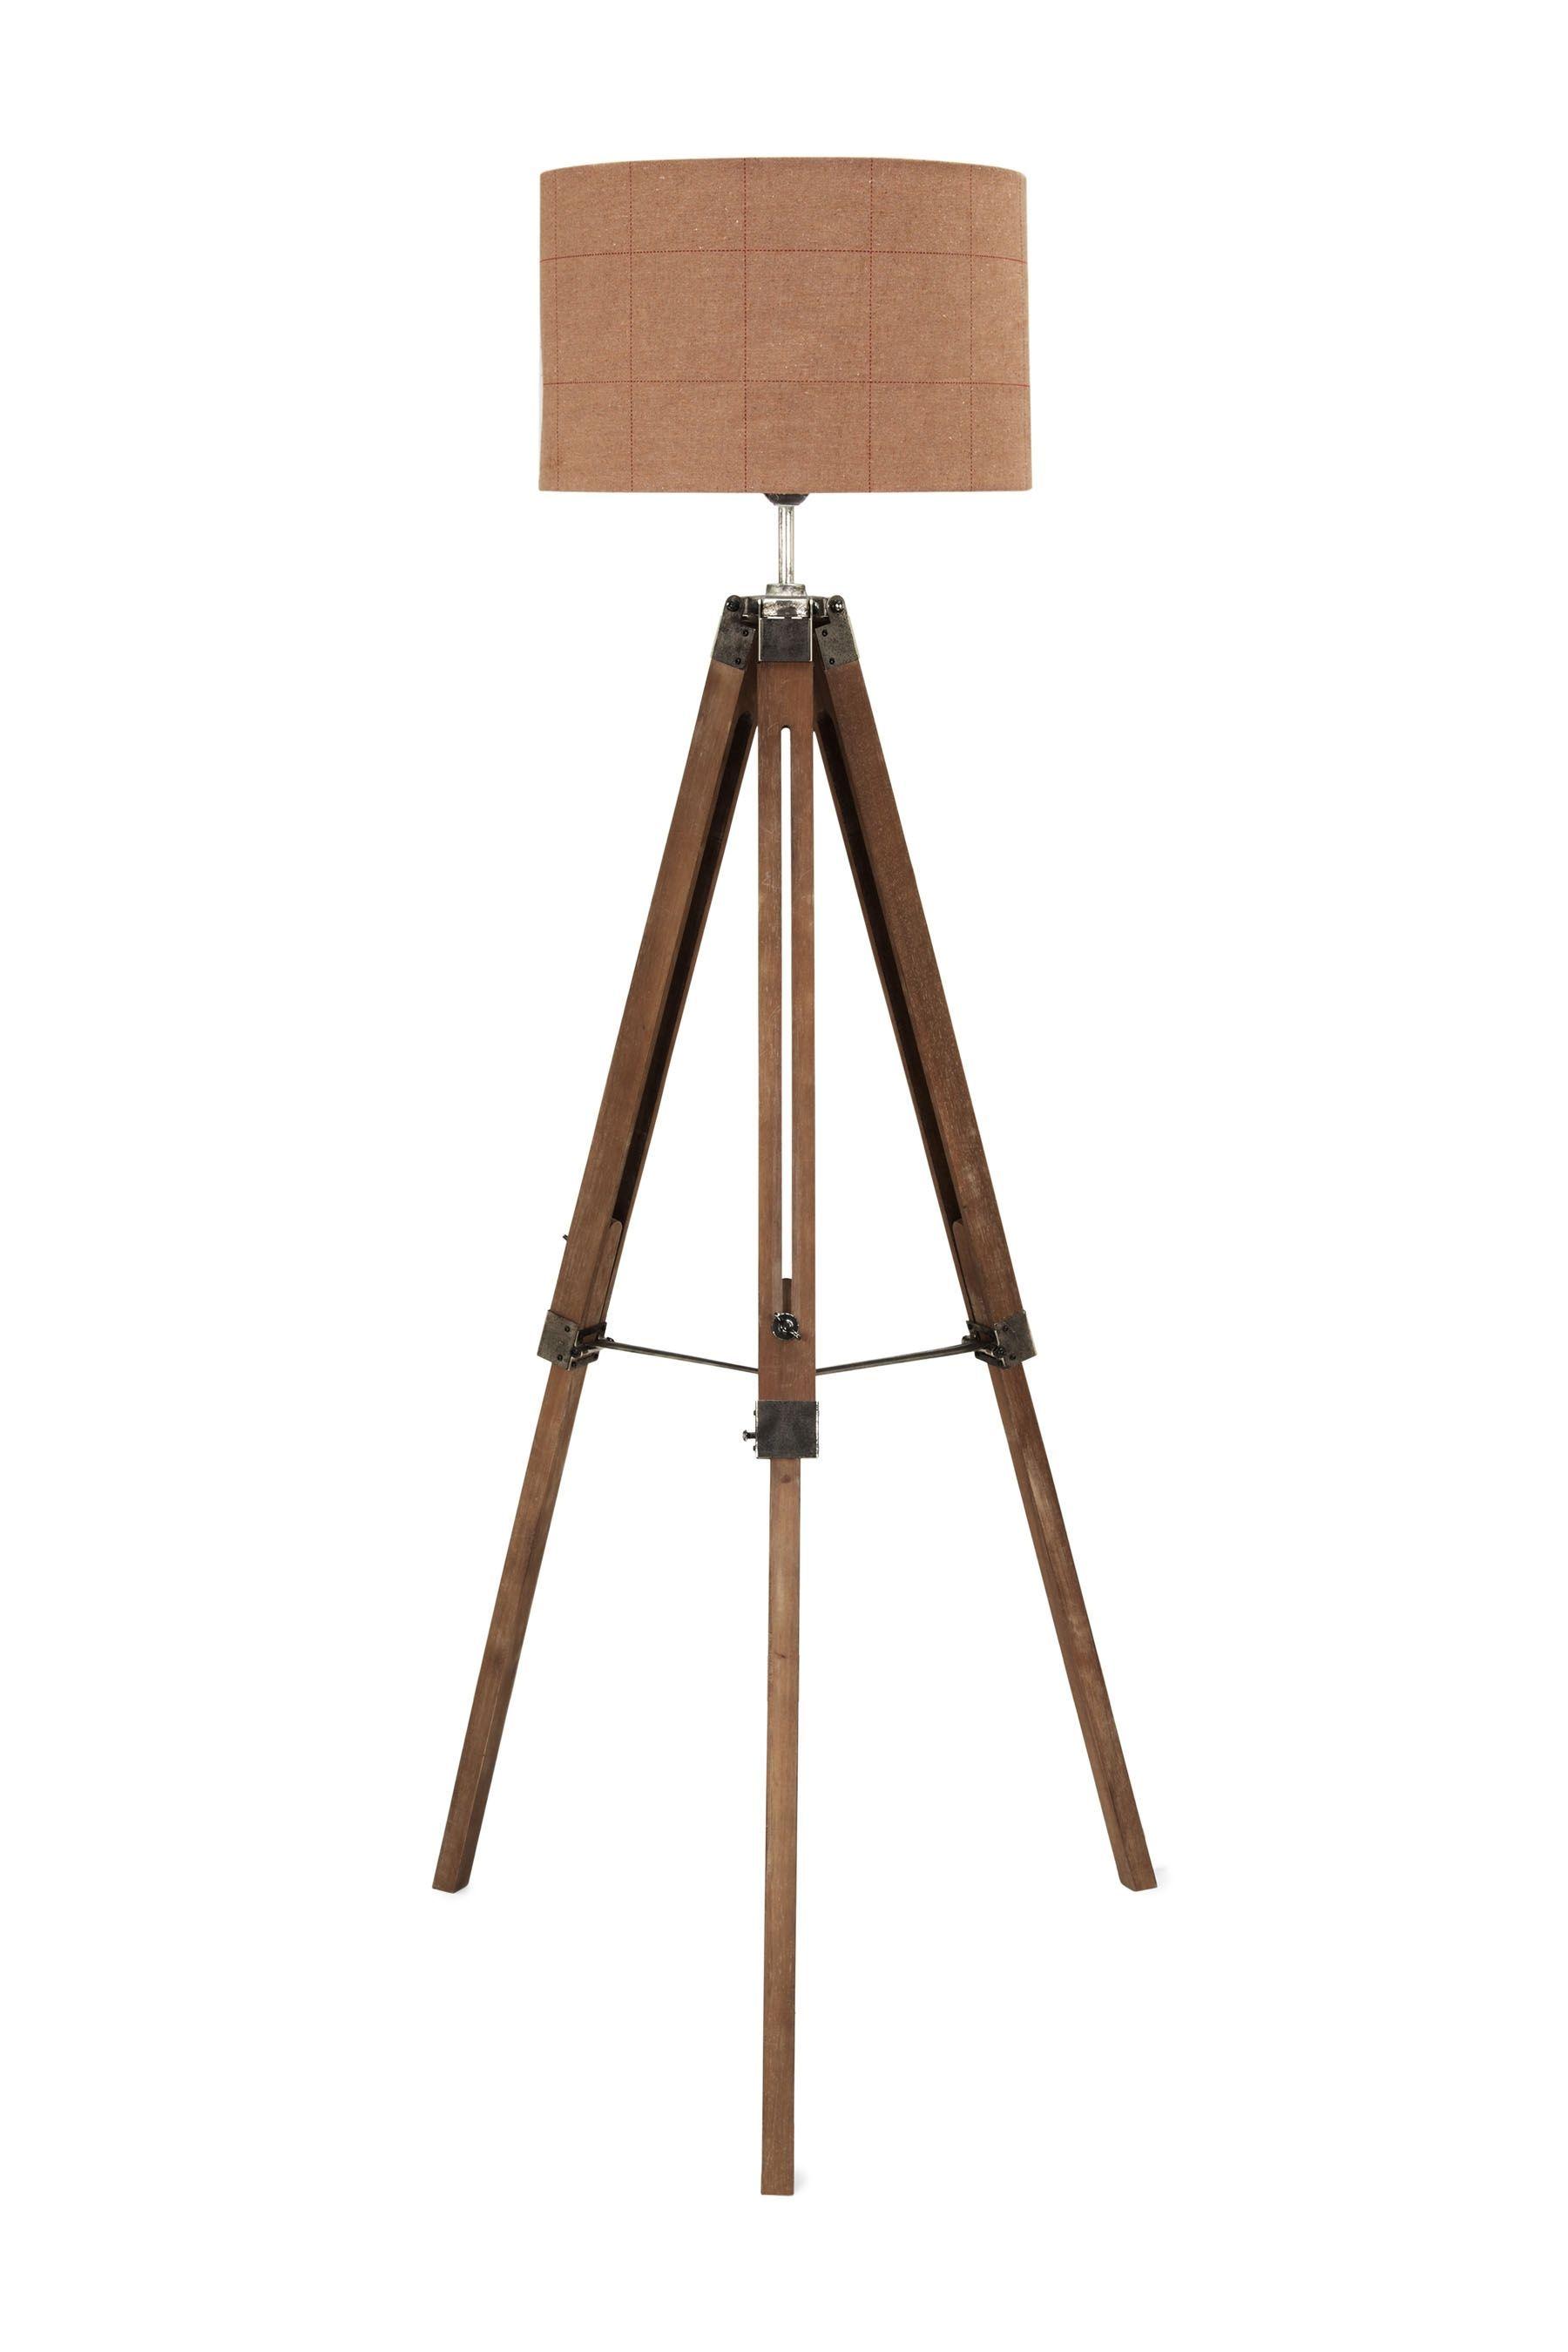 Buy Easel Floor Lamp from the Next UK online shop Wooden